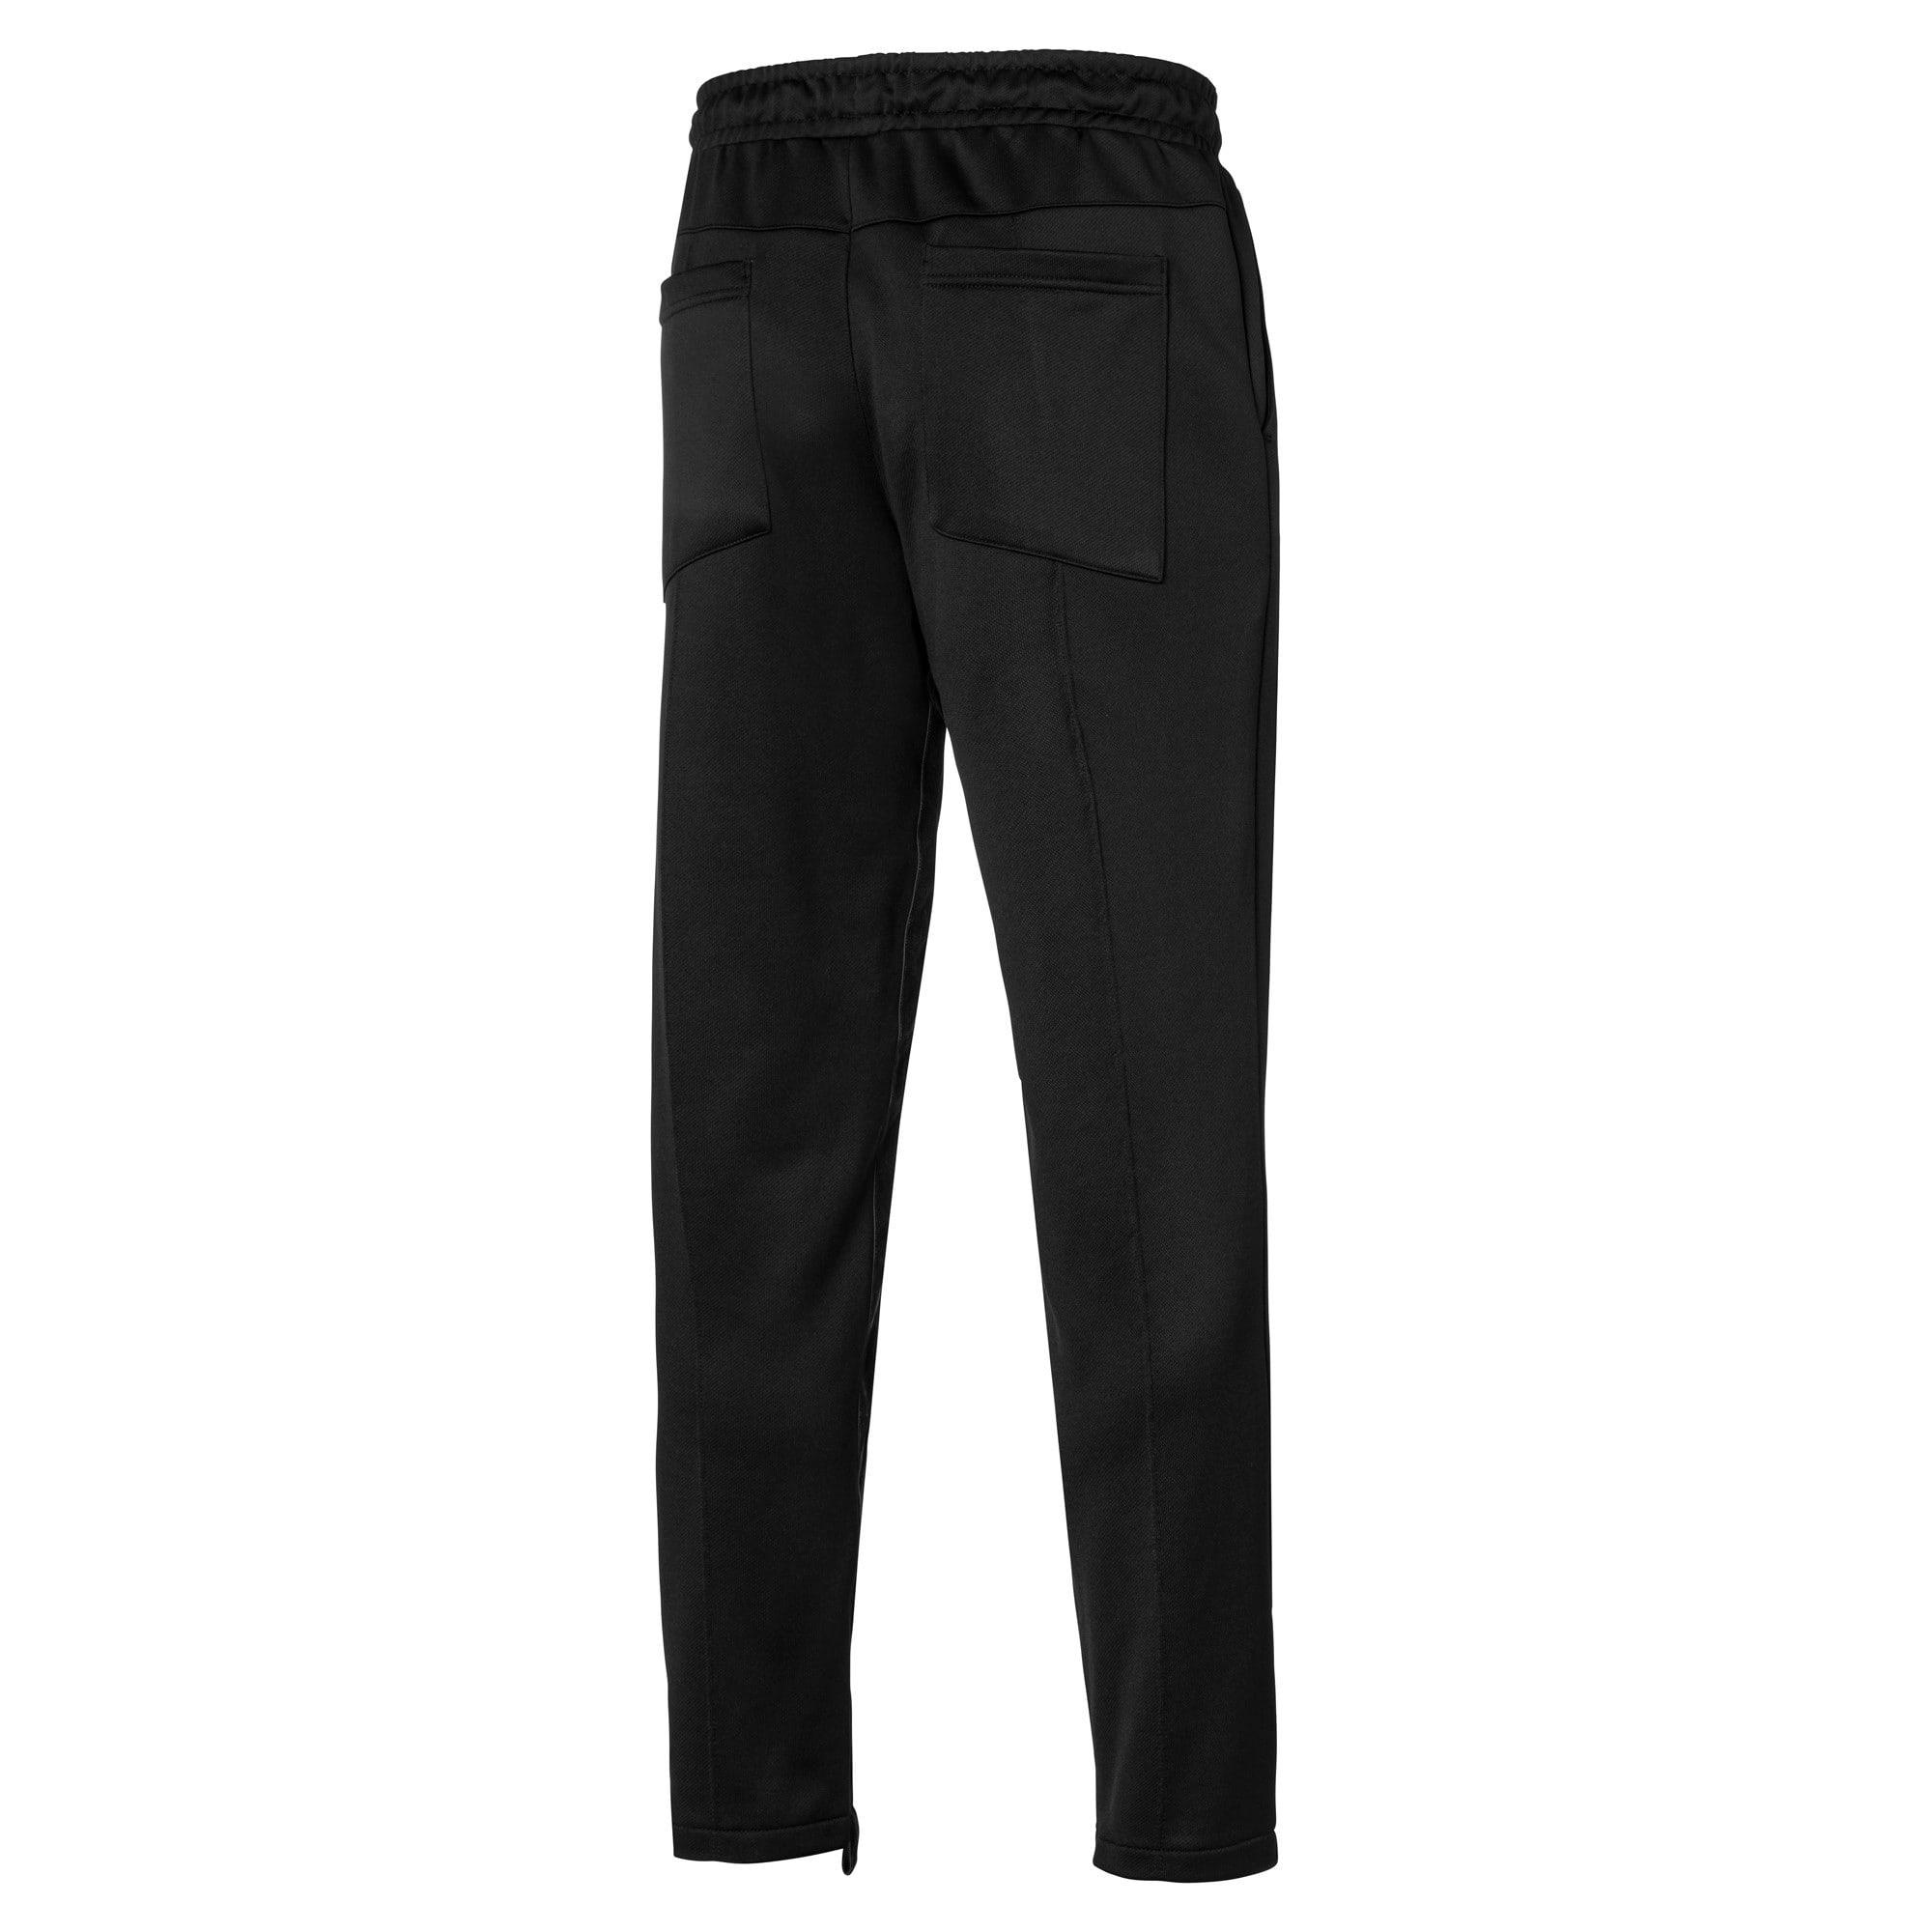 Anteprima 2 di PUMA x RHUDE Knitted Men's Track Pants, Puma Black, medio